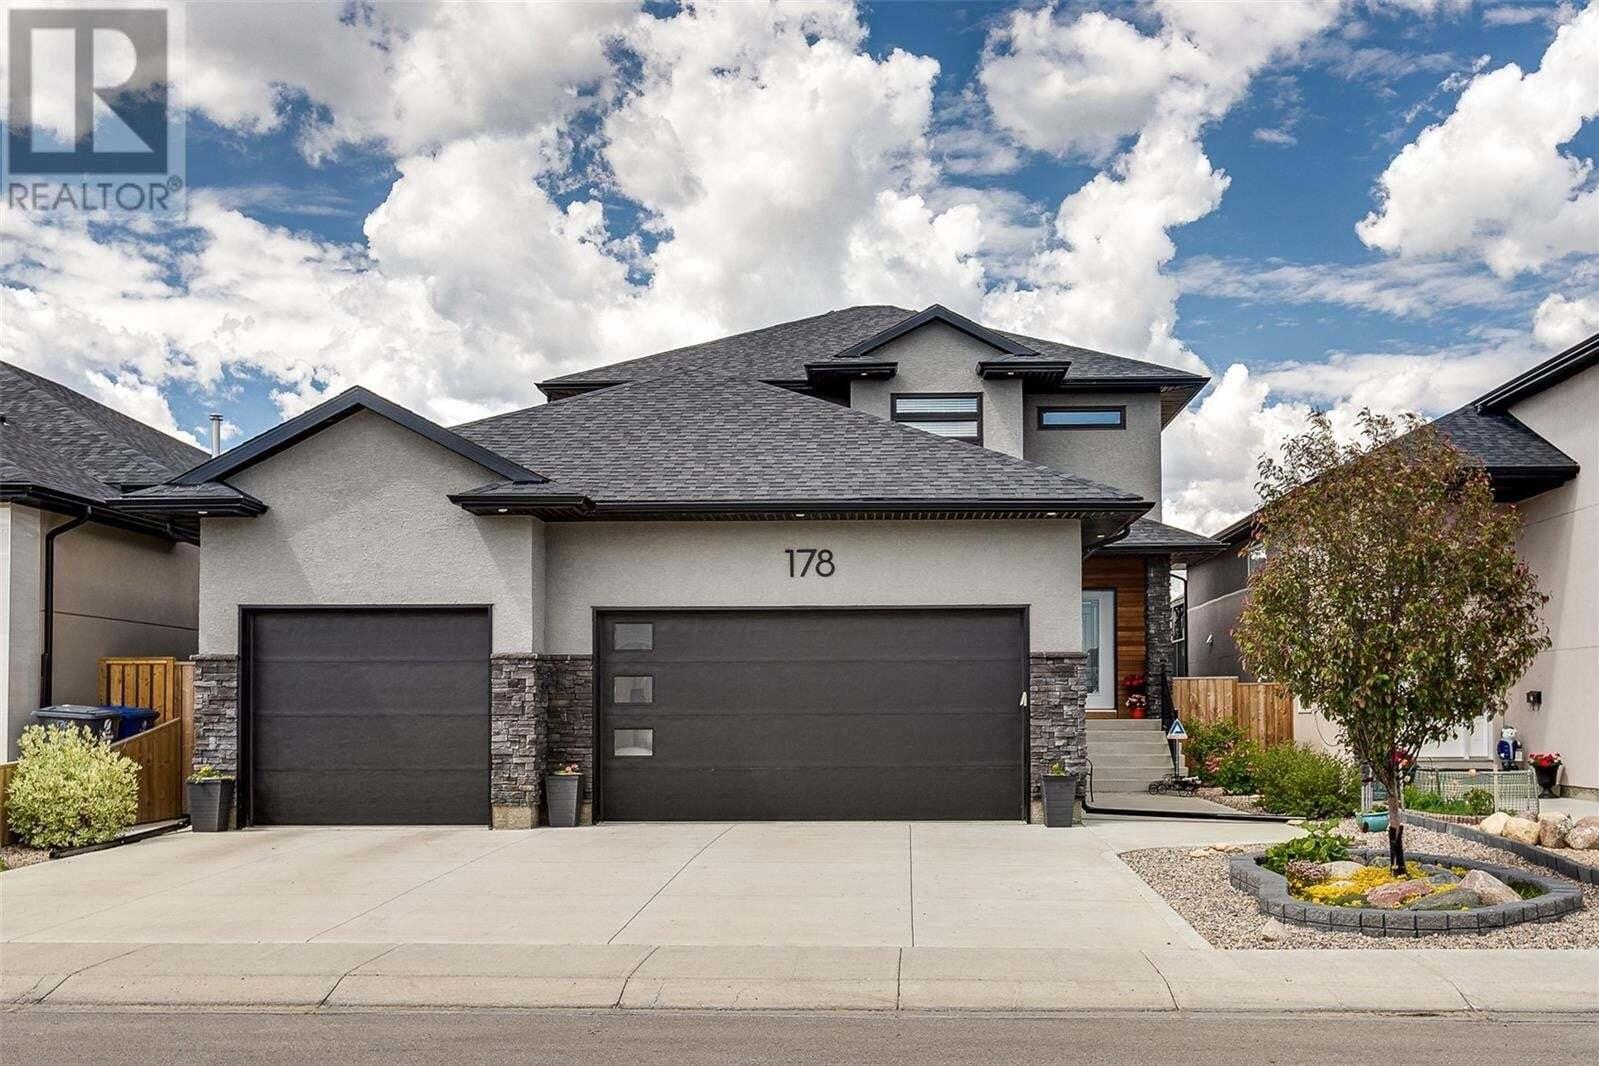 House for sale at 178 Gillies Ln Saskatoon Saskatchewan - MLS: SK827063